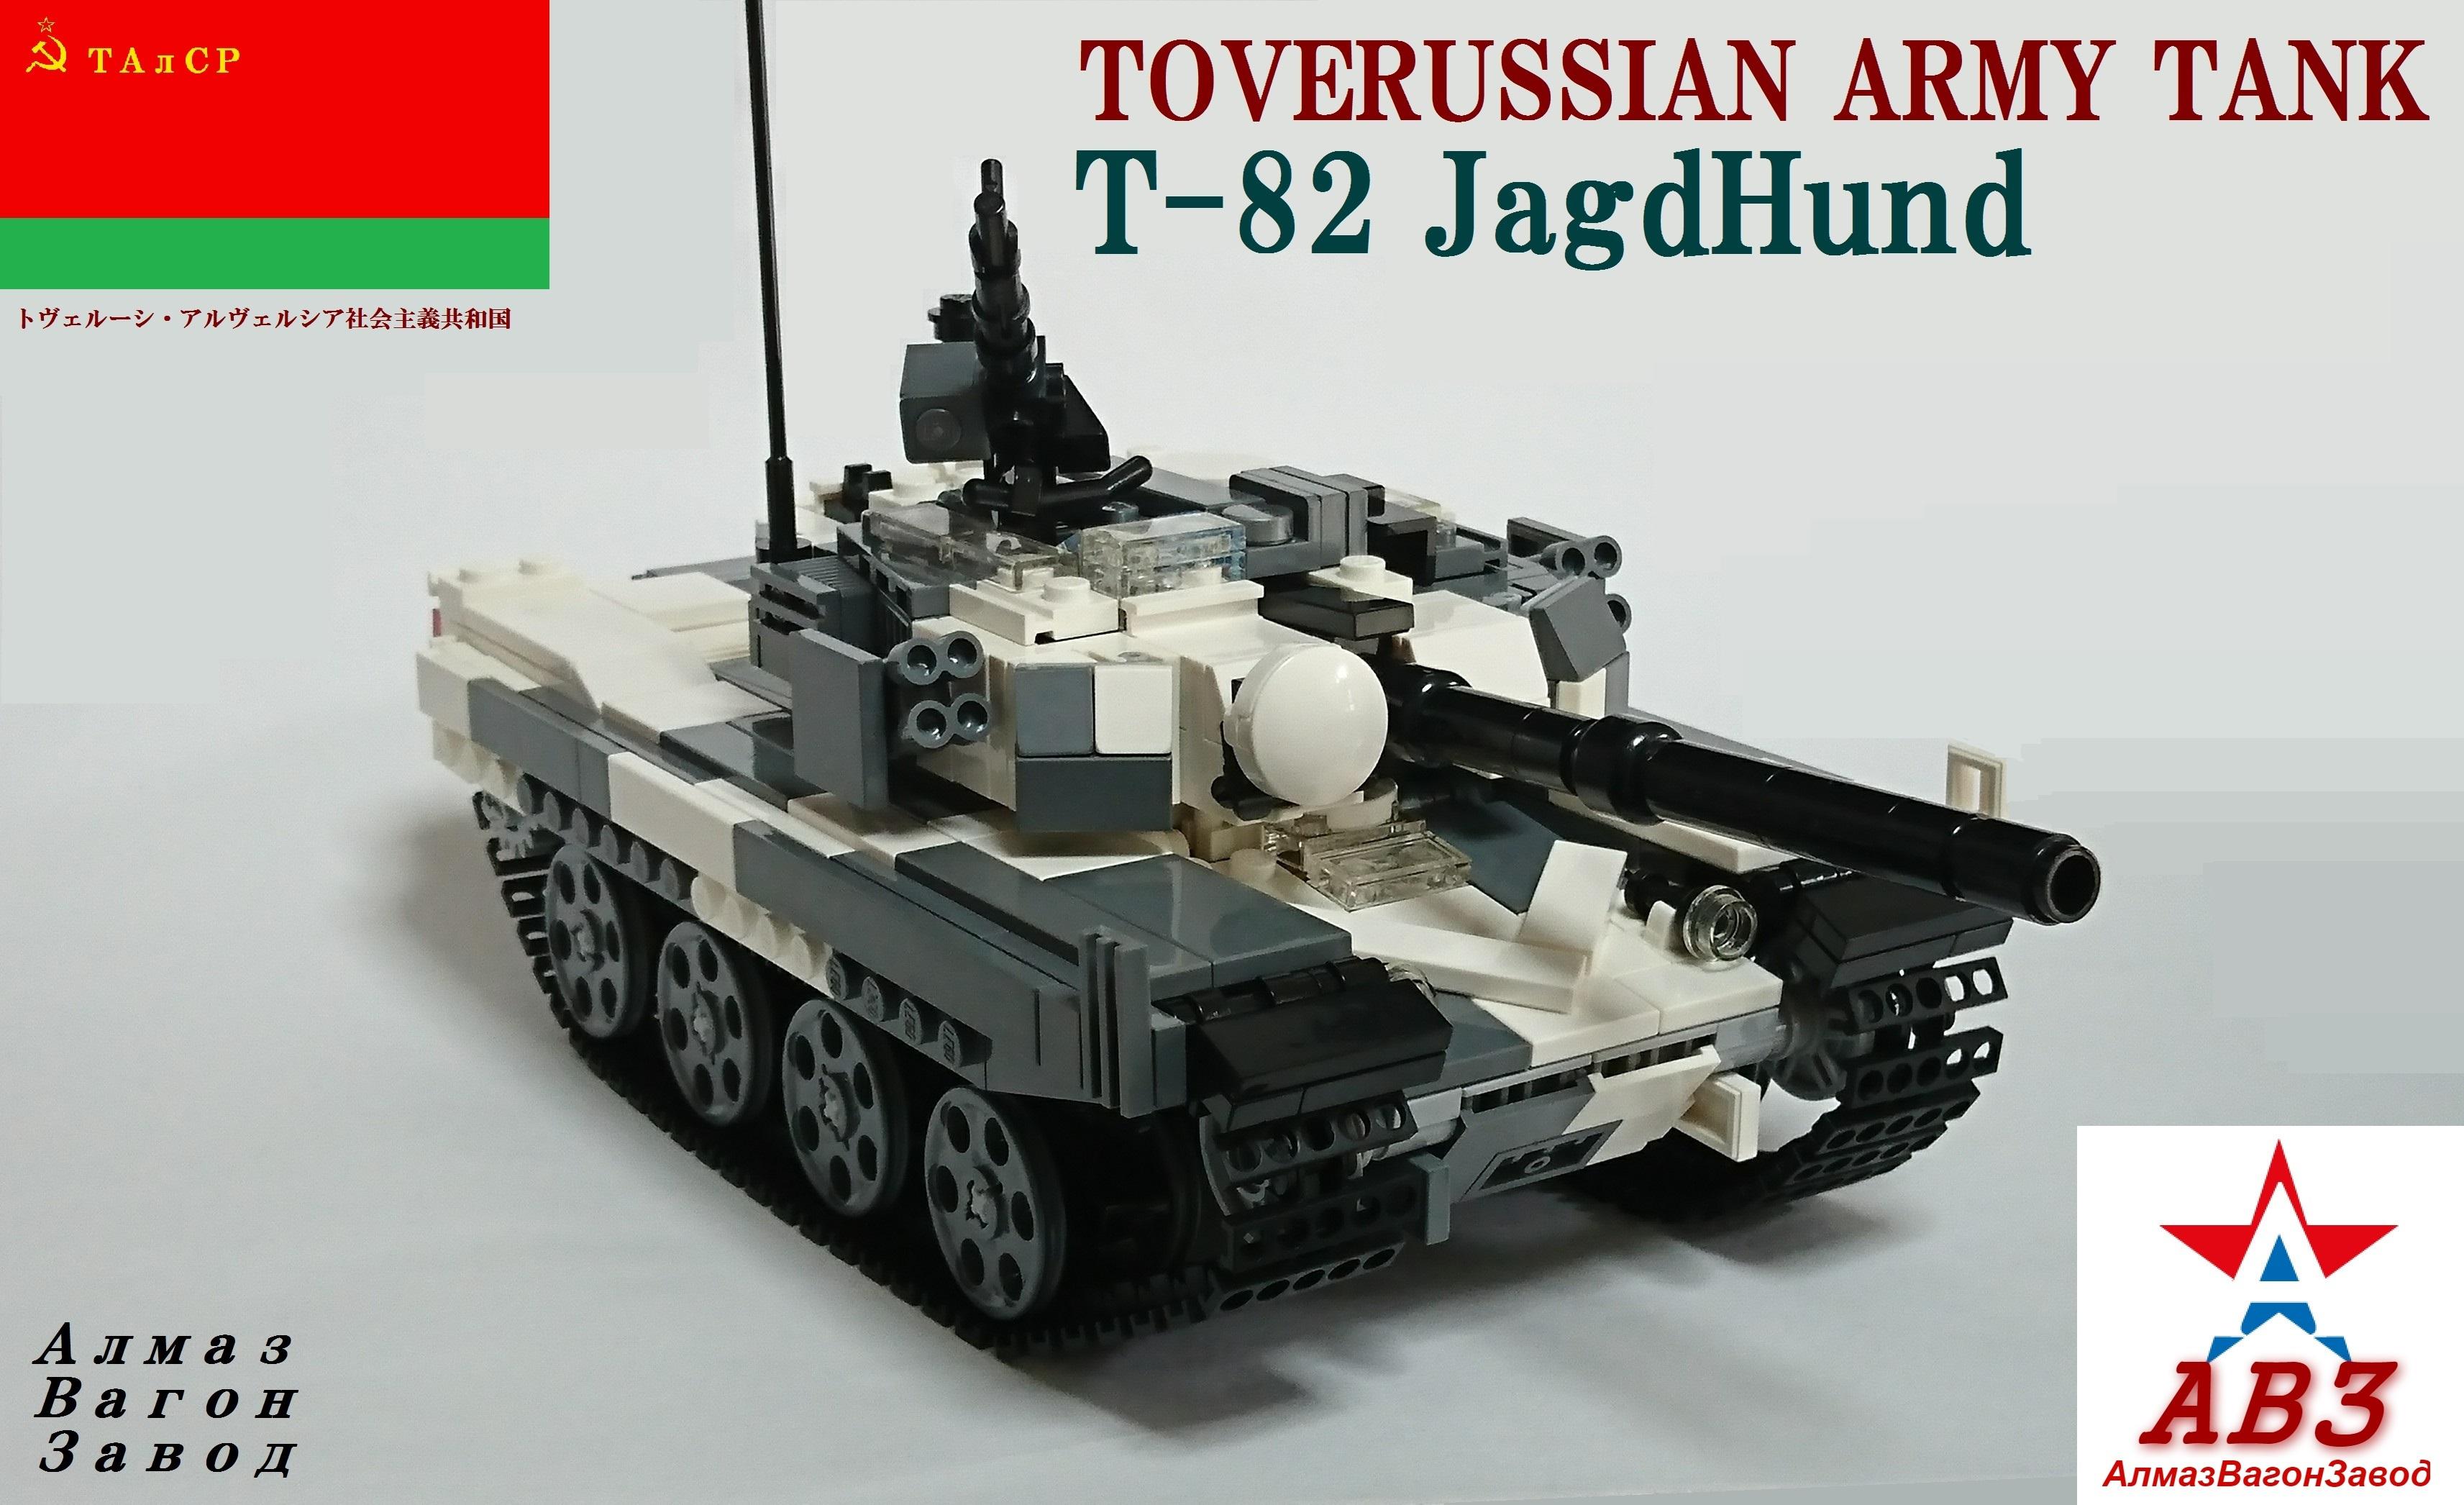 T-82JagdHundMainBattleTank.jpg